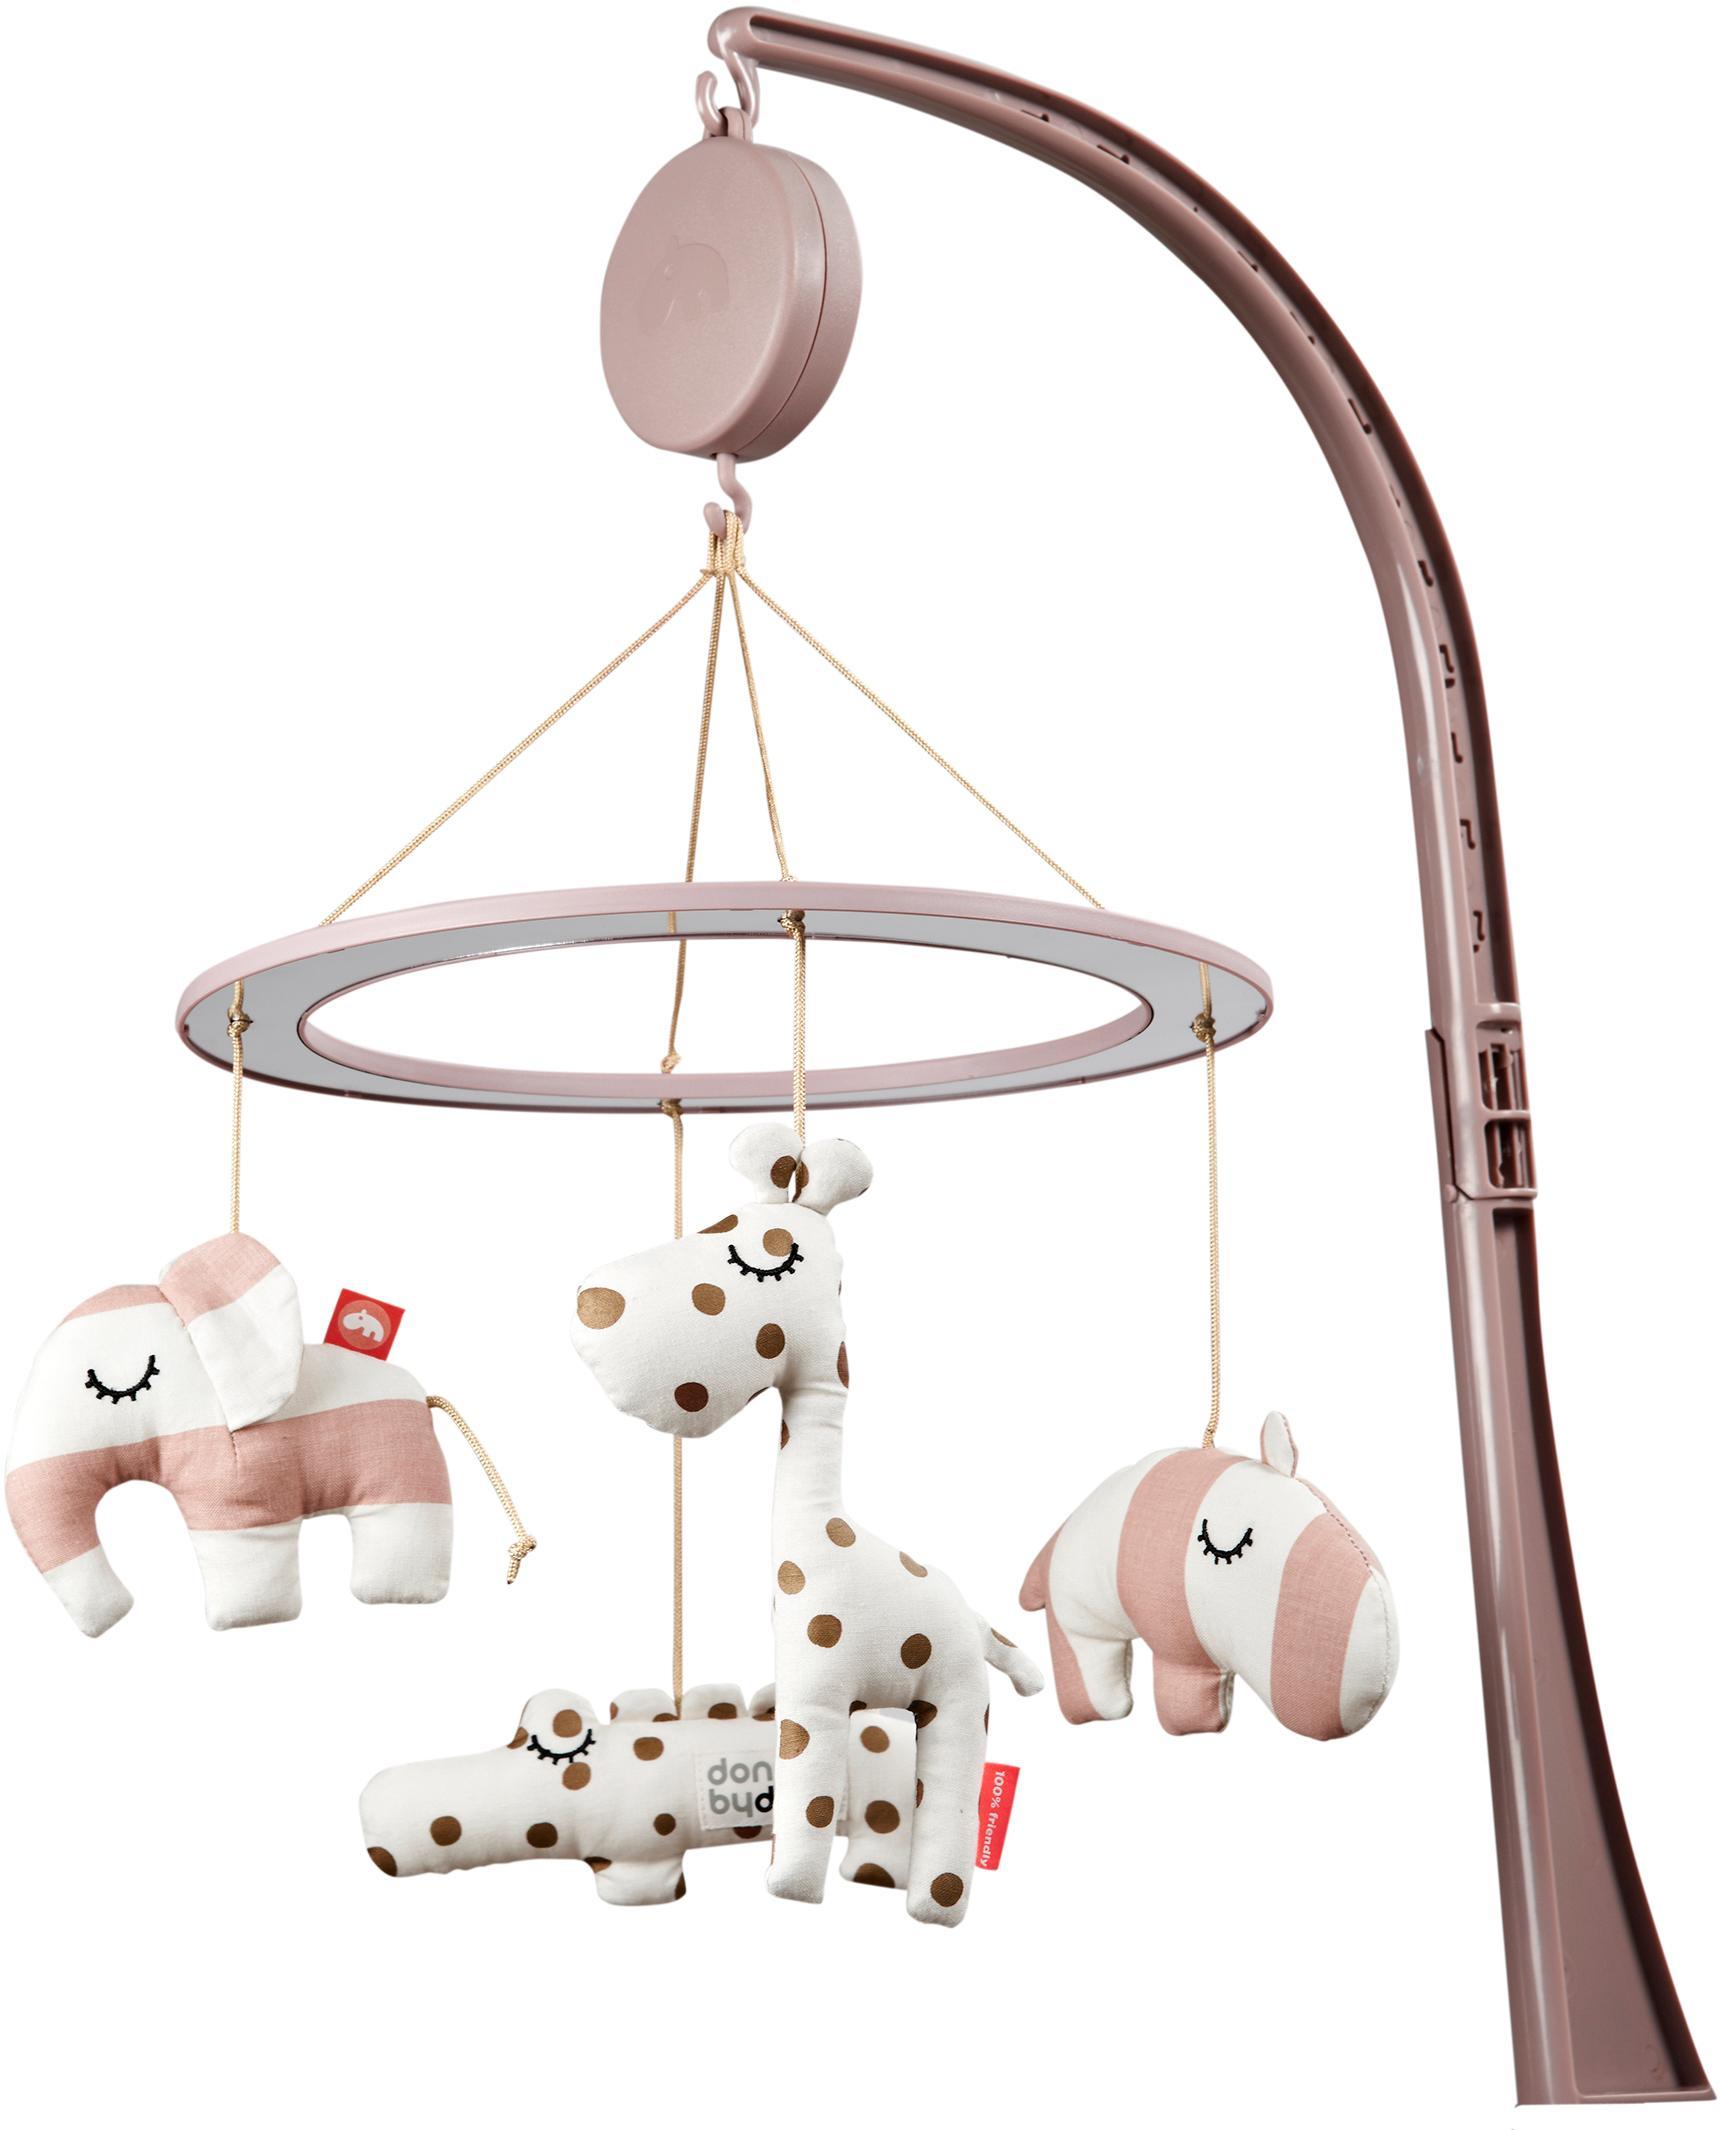 Musik-Mobile Sleepy, Bezug: 100% Baumwolle, Halterung: Metall, Kunststoff (ABS, , Rosa, 34 x 39 cm